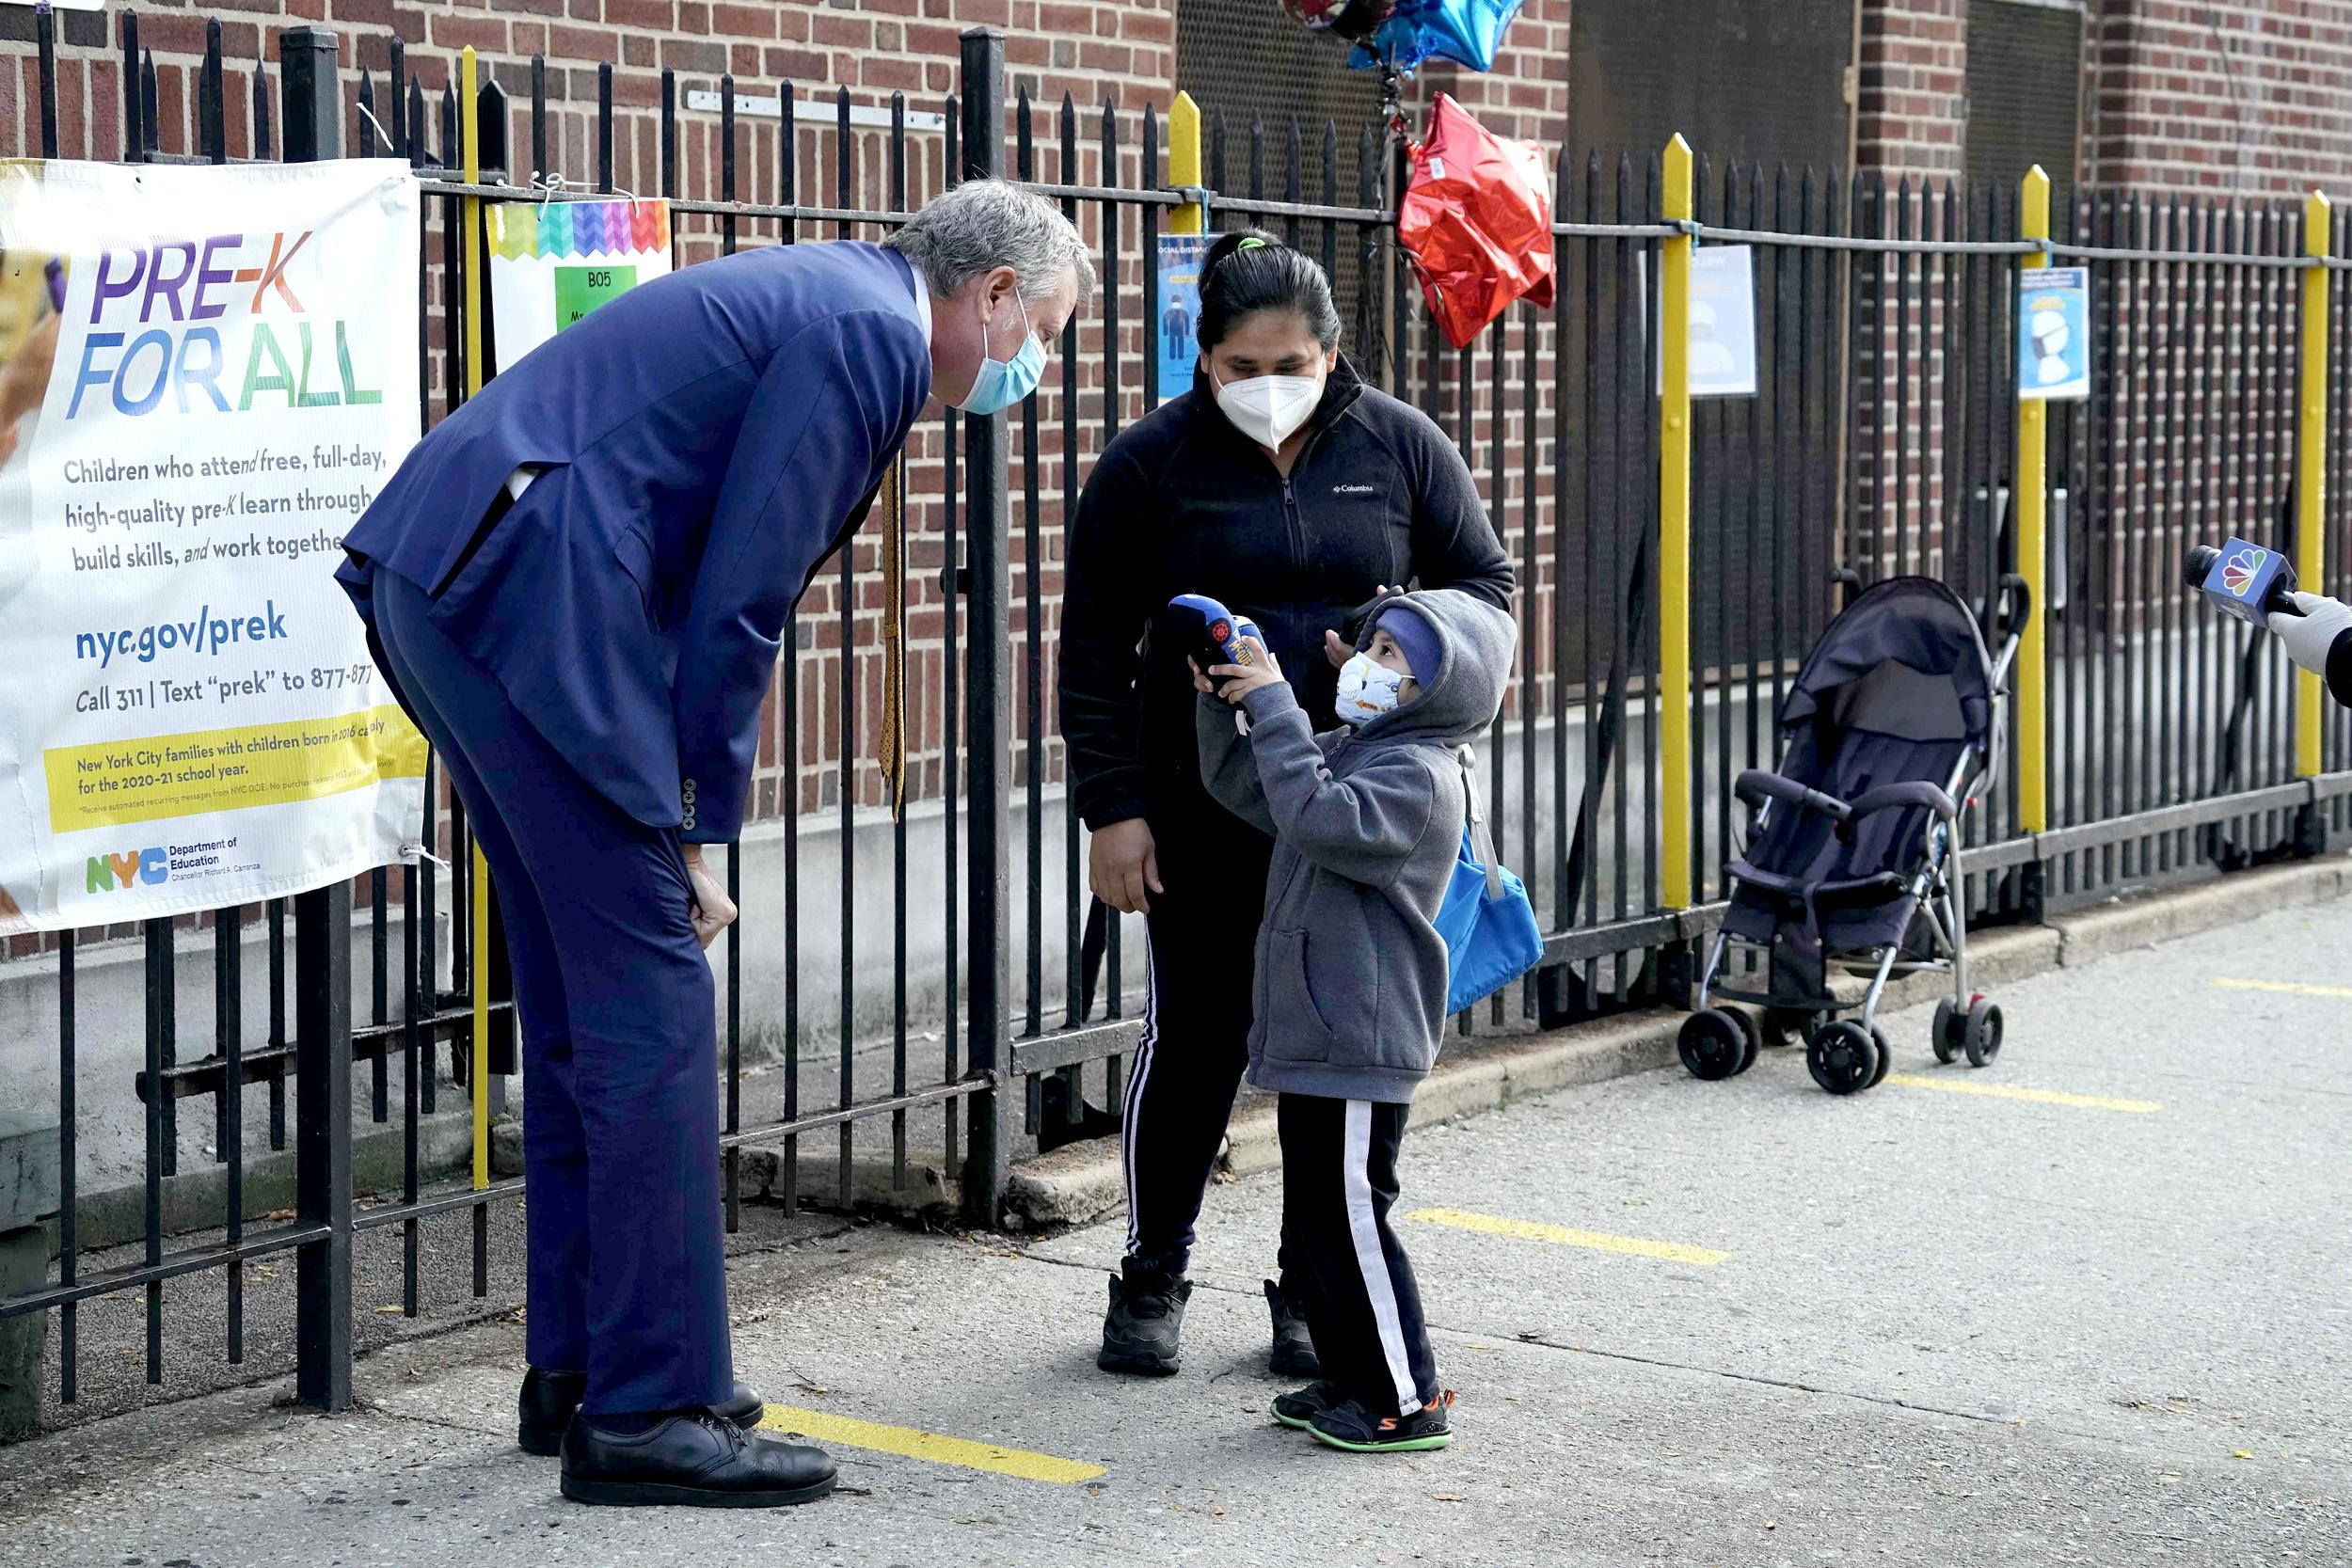 'Twindemic' looms as pandemic slides into flu season